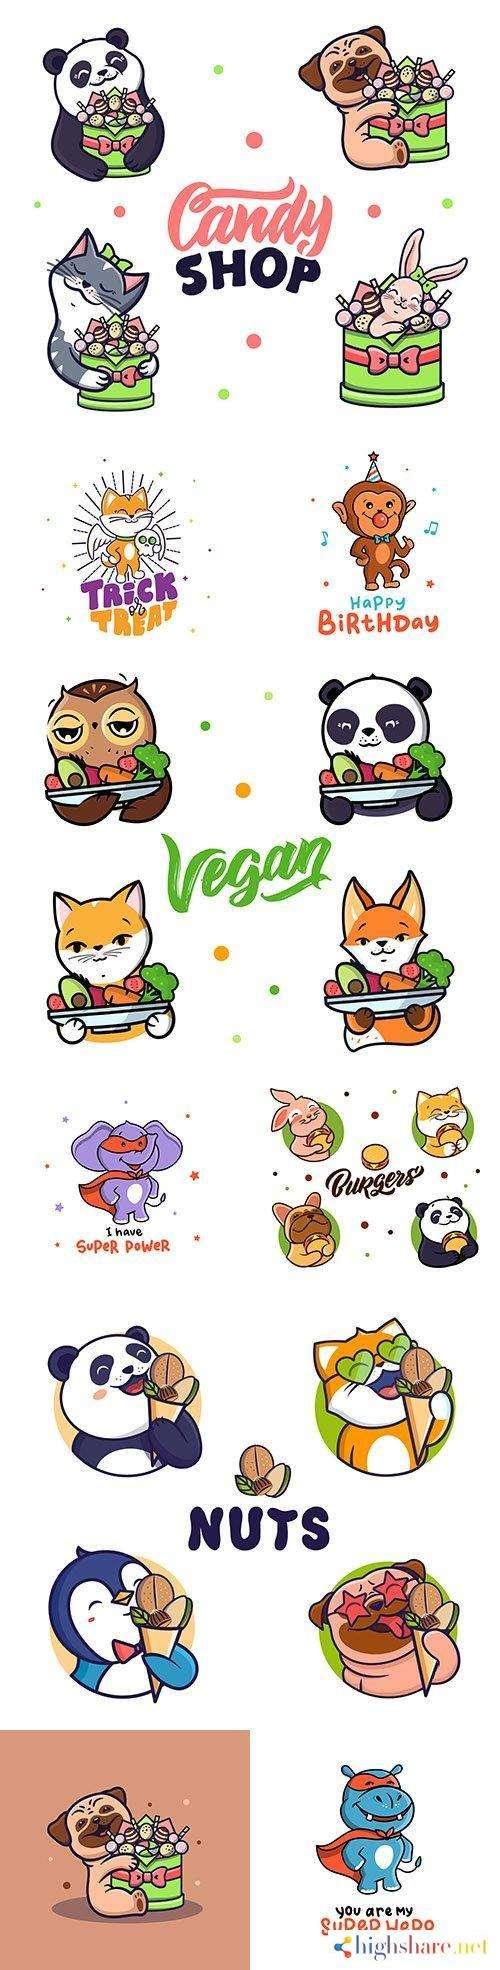 animal cute cartoon emblem and logos design 5f412ec18688a - Animal cute cartoon emblem and logos design